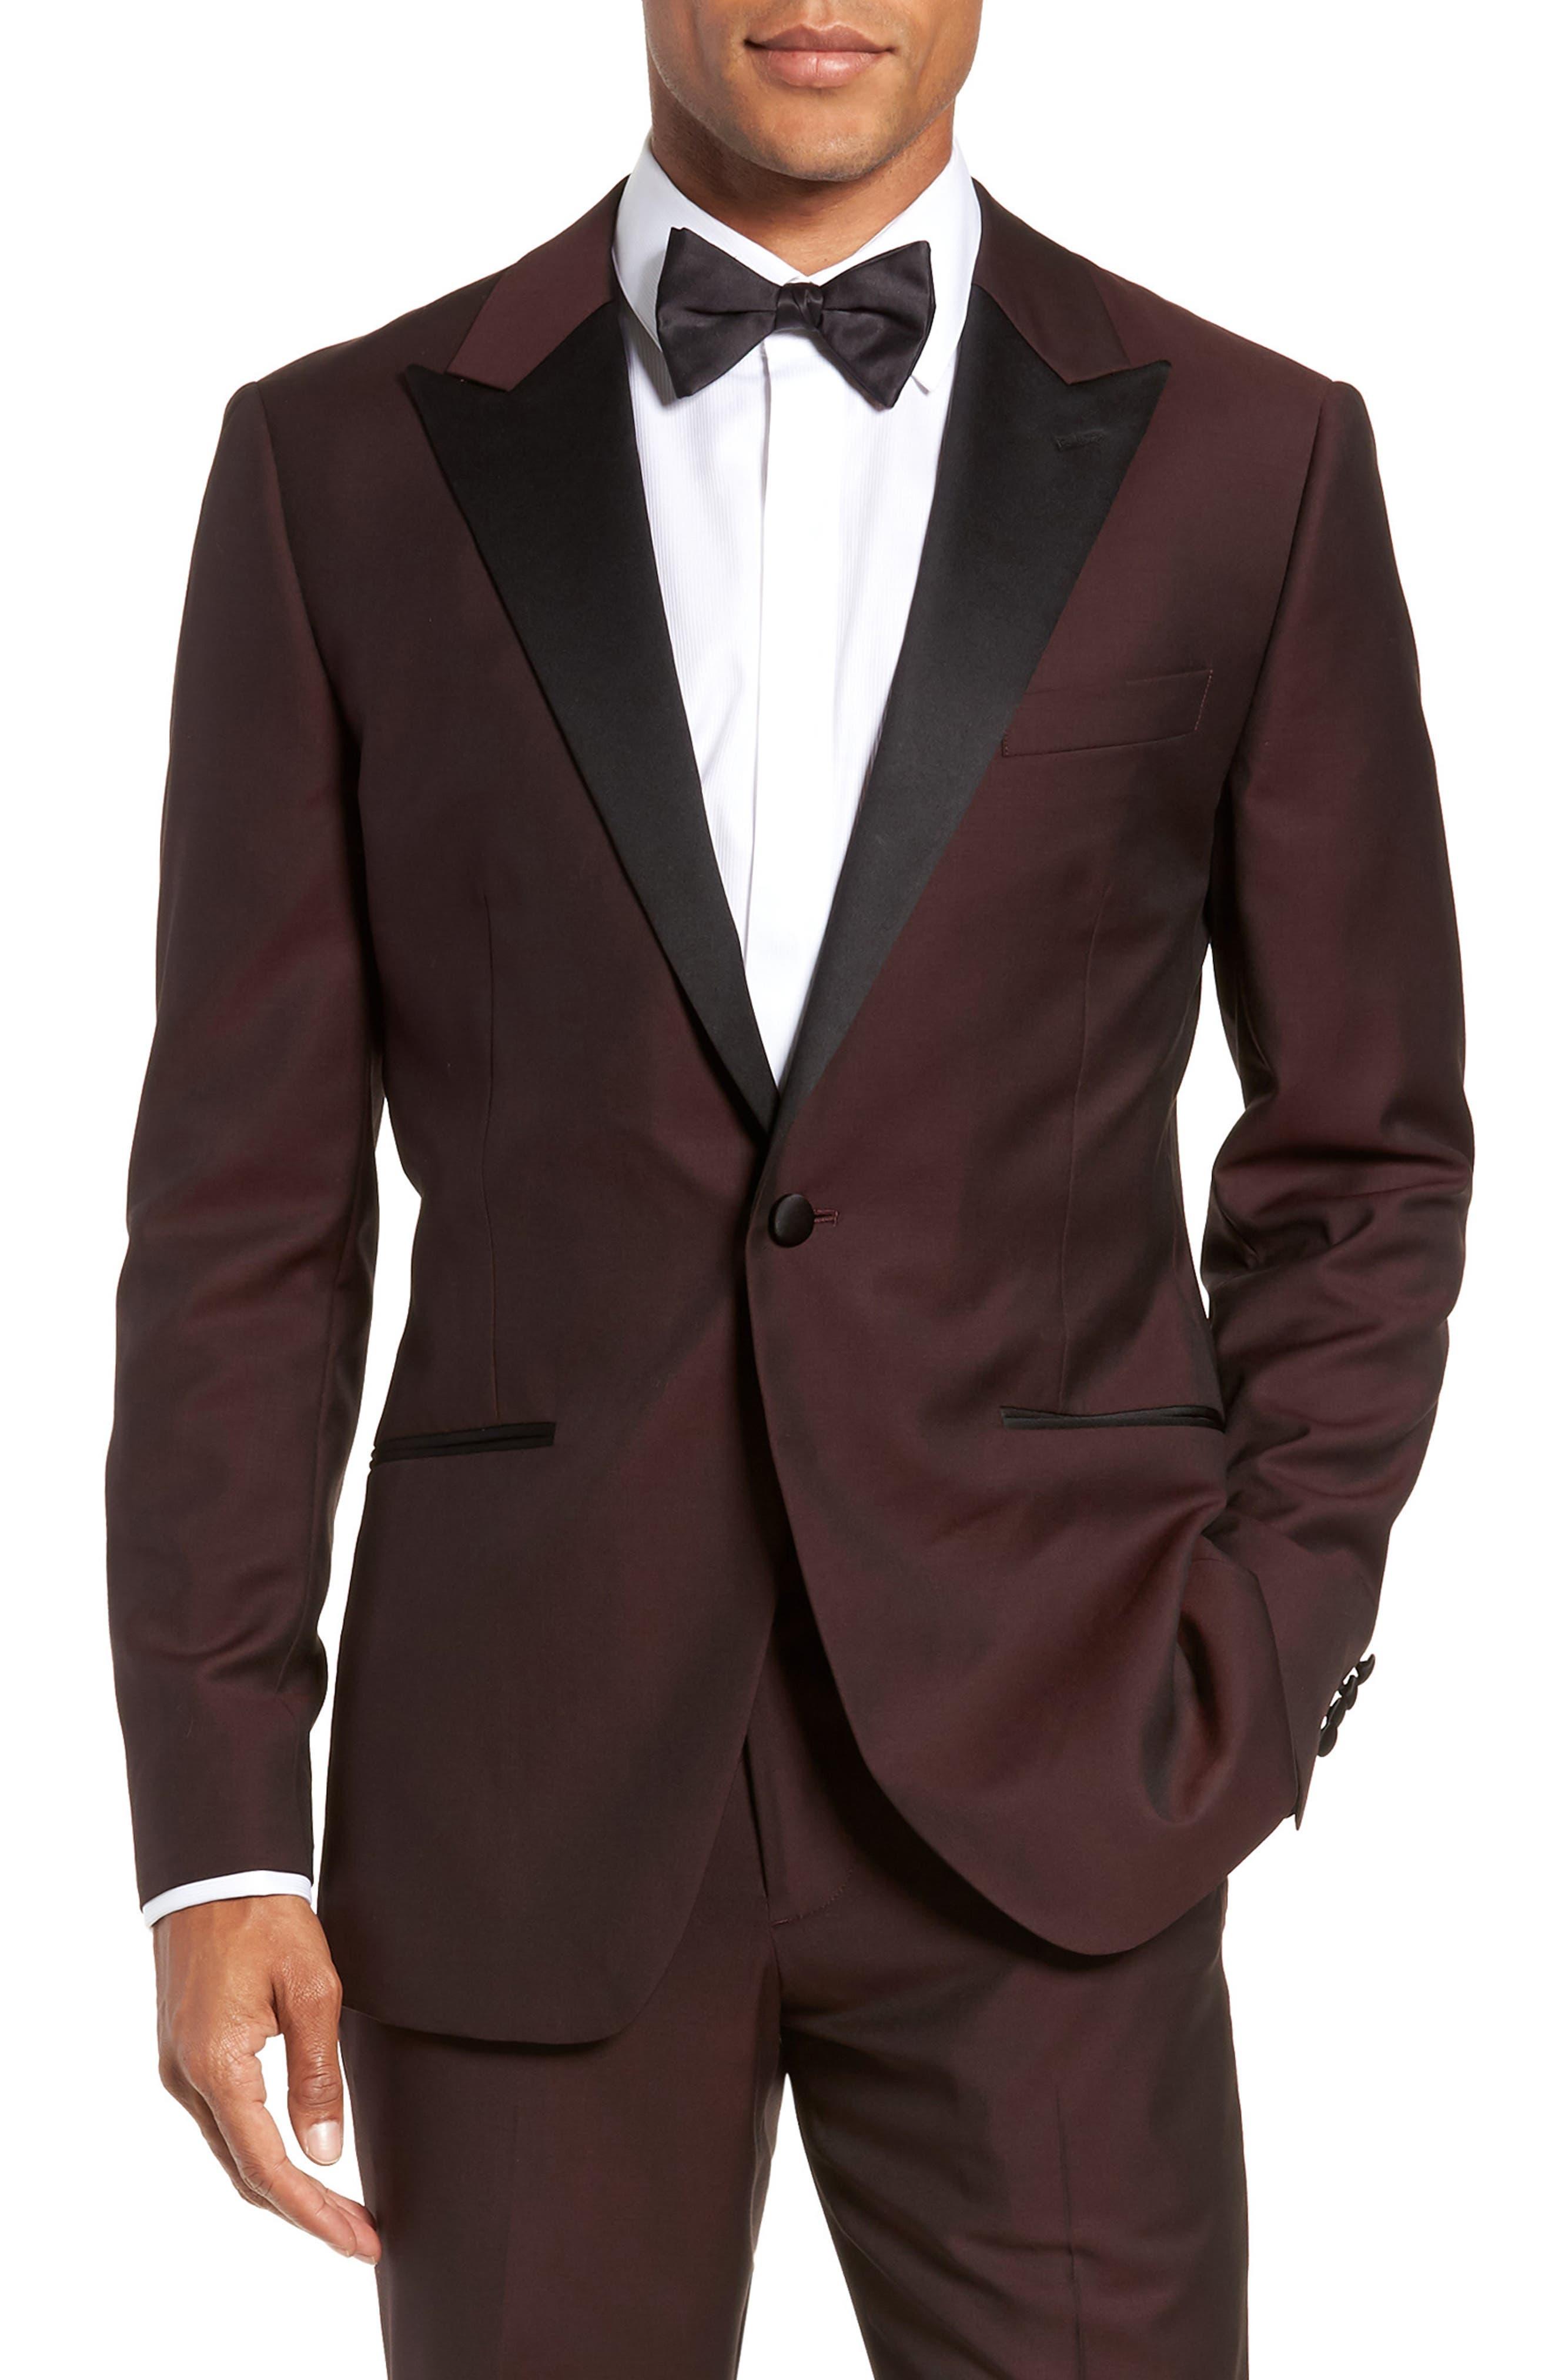 Capstone Slim Fit Italian Wool Dinner Jacket,                             Main thumbnail 1, color,                             MAROON